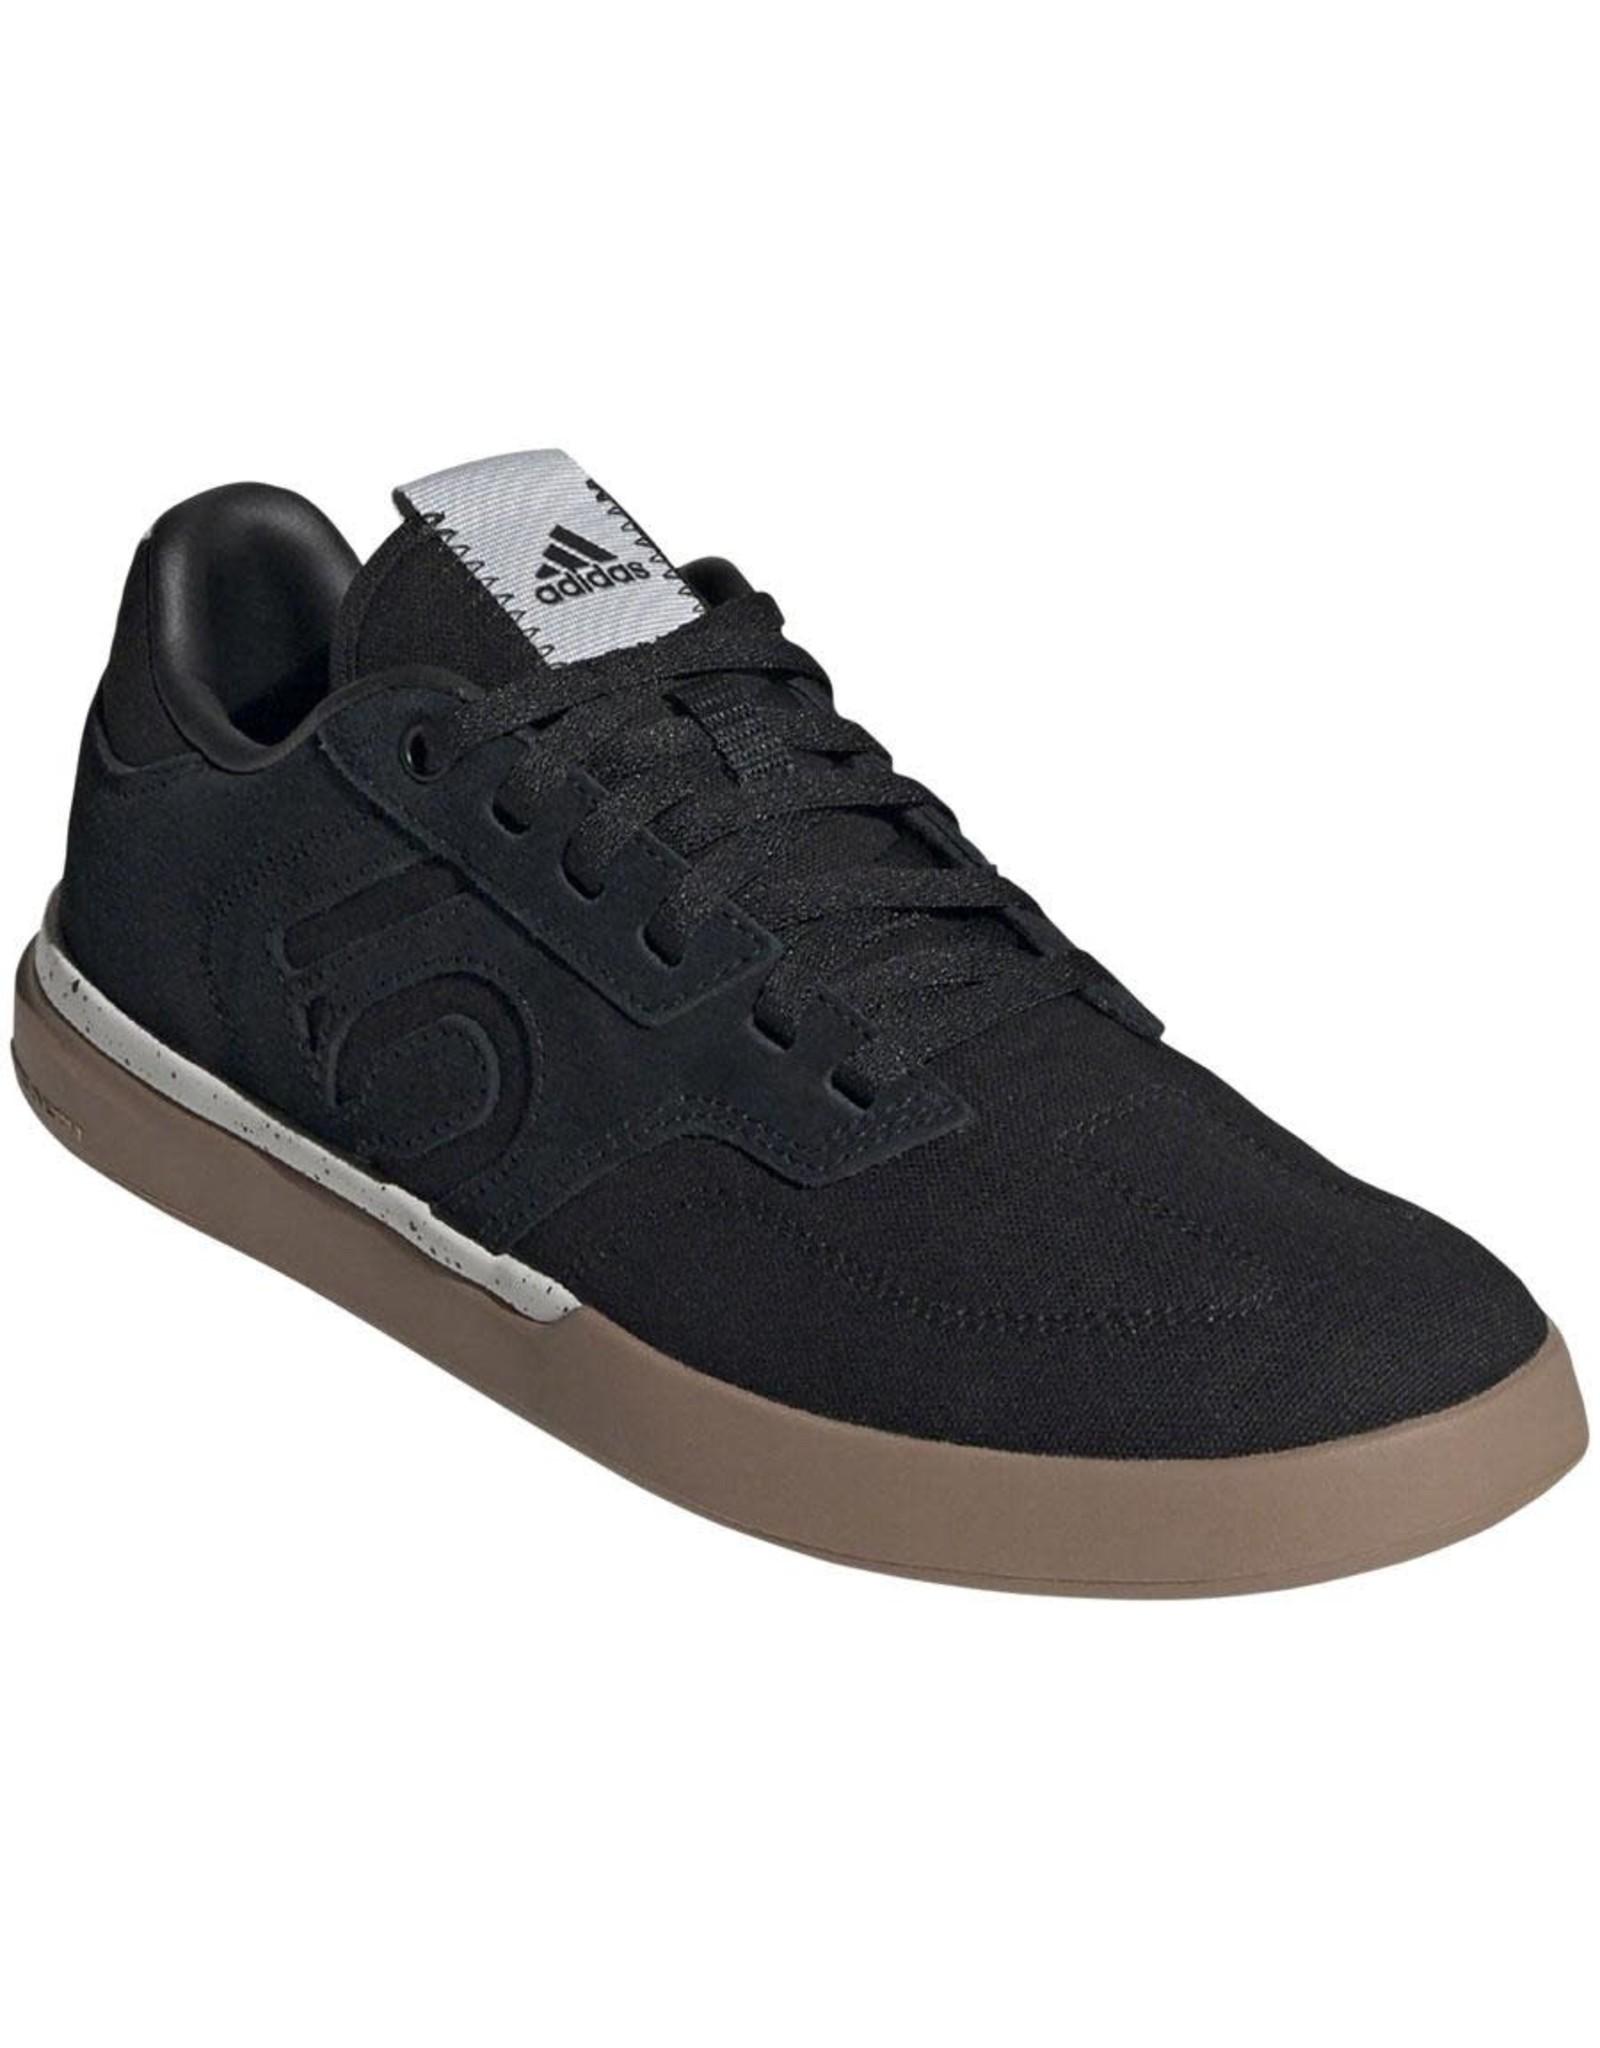 Five Ten Five Ten Sleuth Men's Flat Shoe: Black/Black/Gum 11